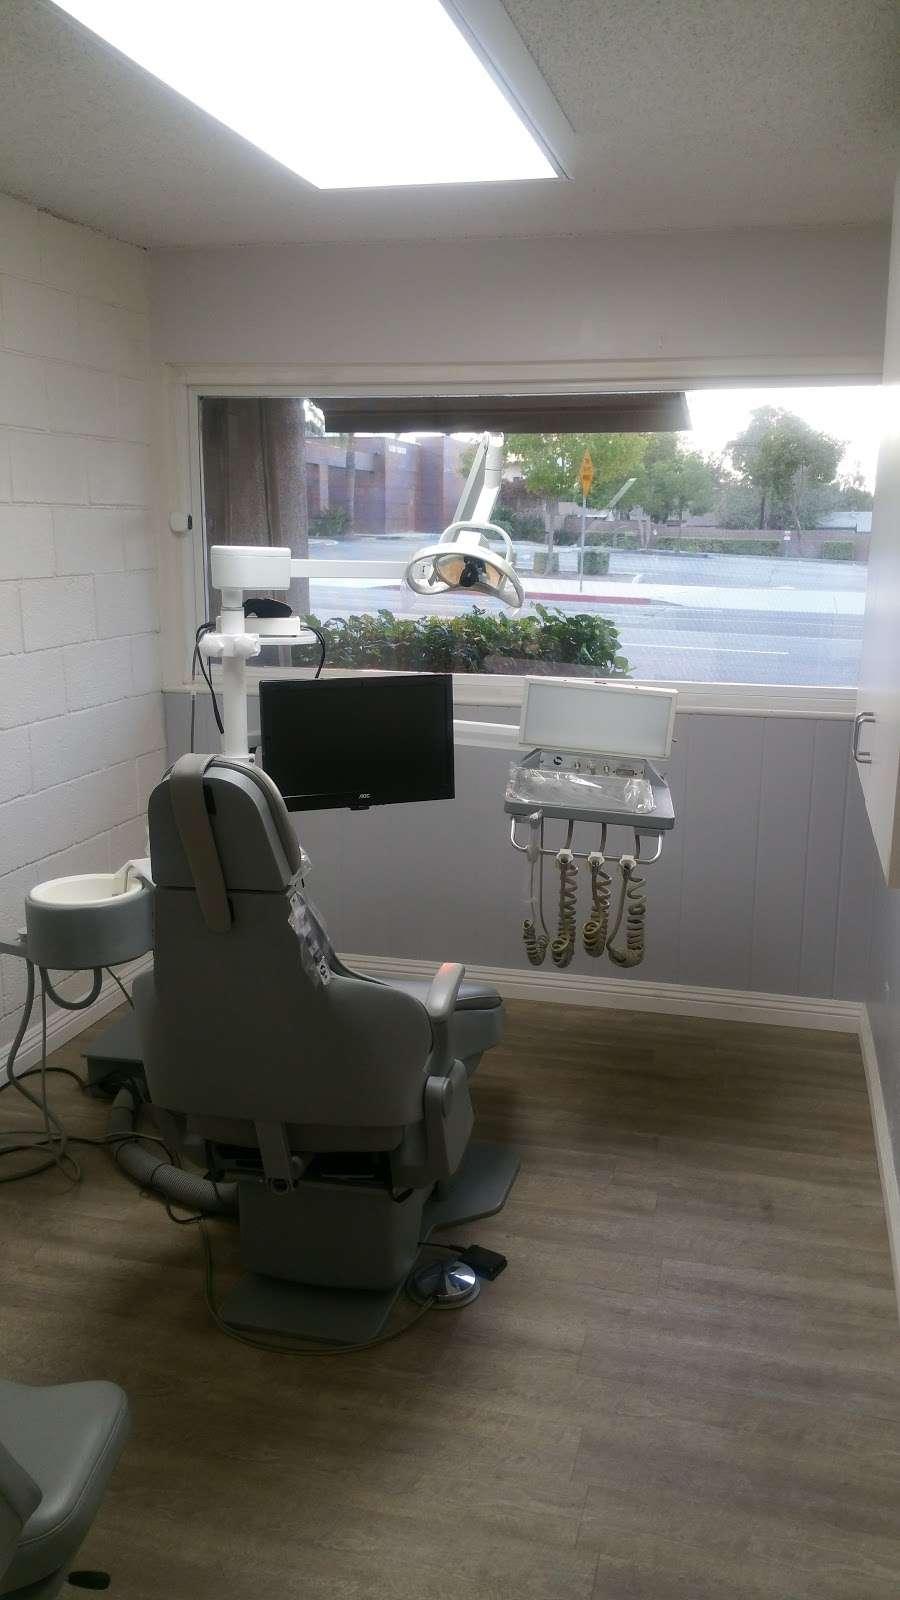 Kilzi Dental Corporation - dentist    Photo 2 of 9   Address: 1113 S Main St B, Corona, CA 92882, USA   Phone: (951) 739-0752